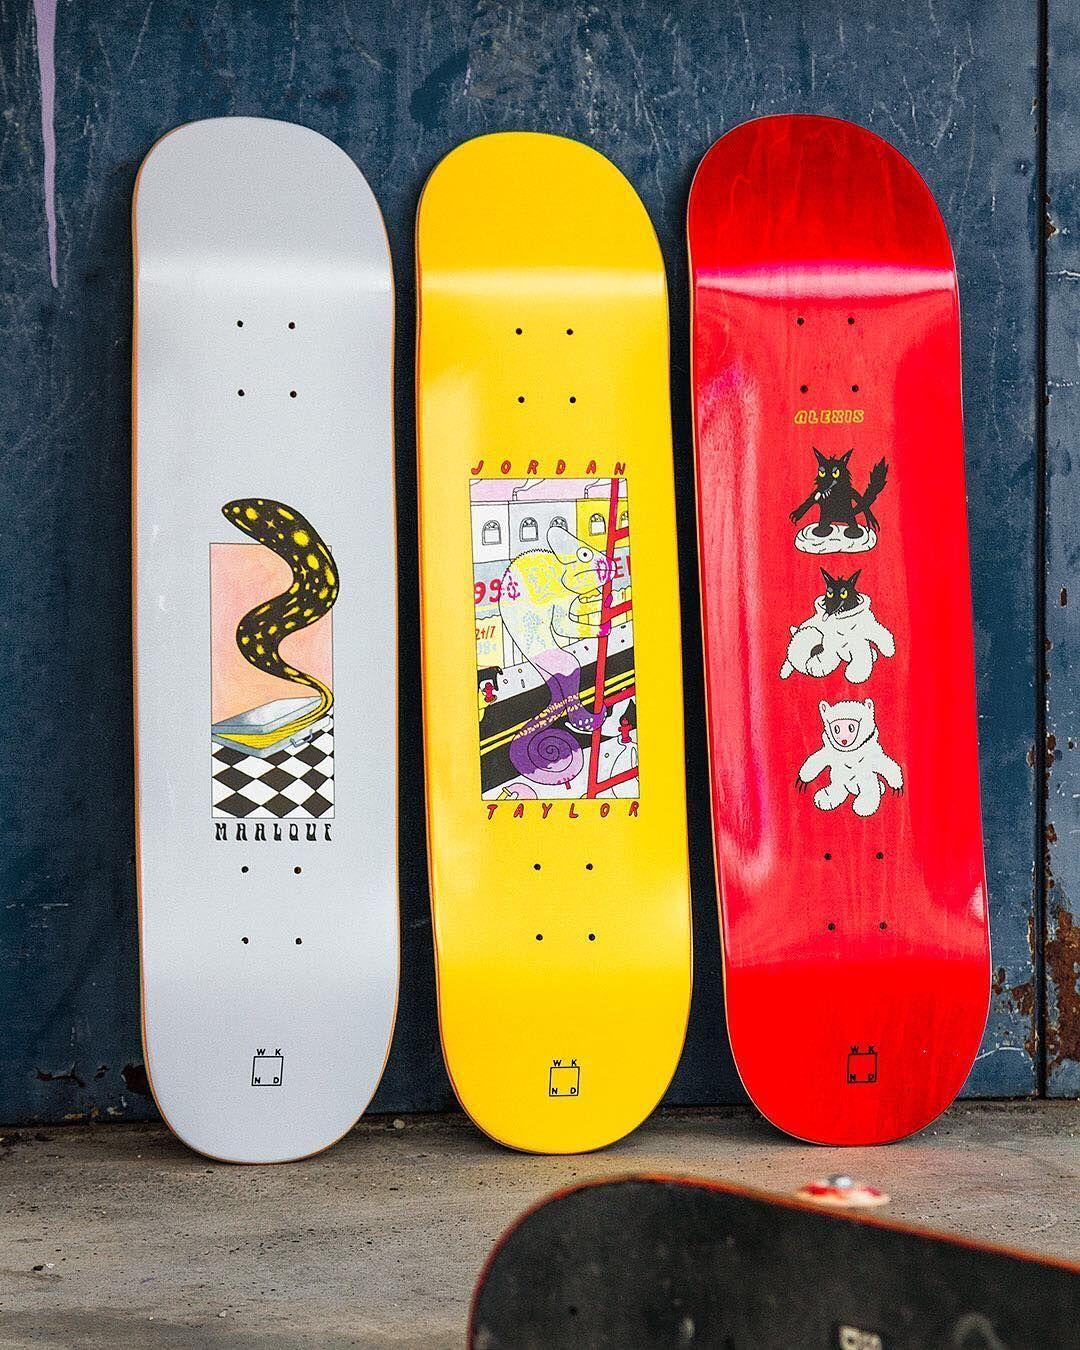 Skateboard Skateboard Design Cool Skateboards Skateboard Deck Art